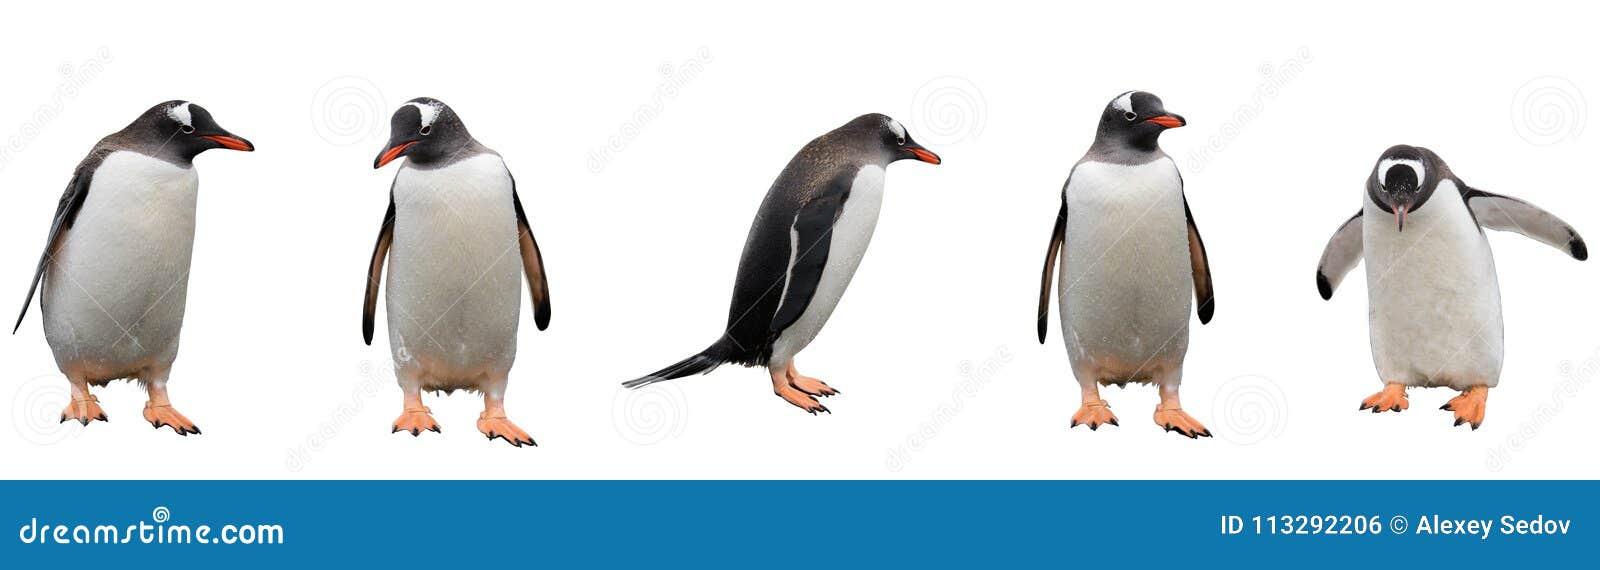 Pinguins de Gentoo isolados no branco